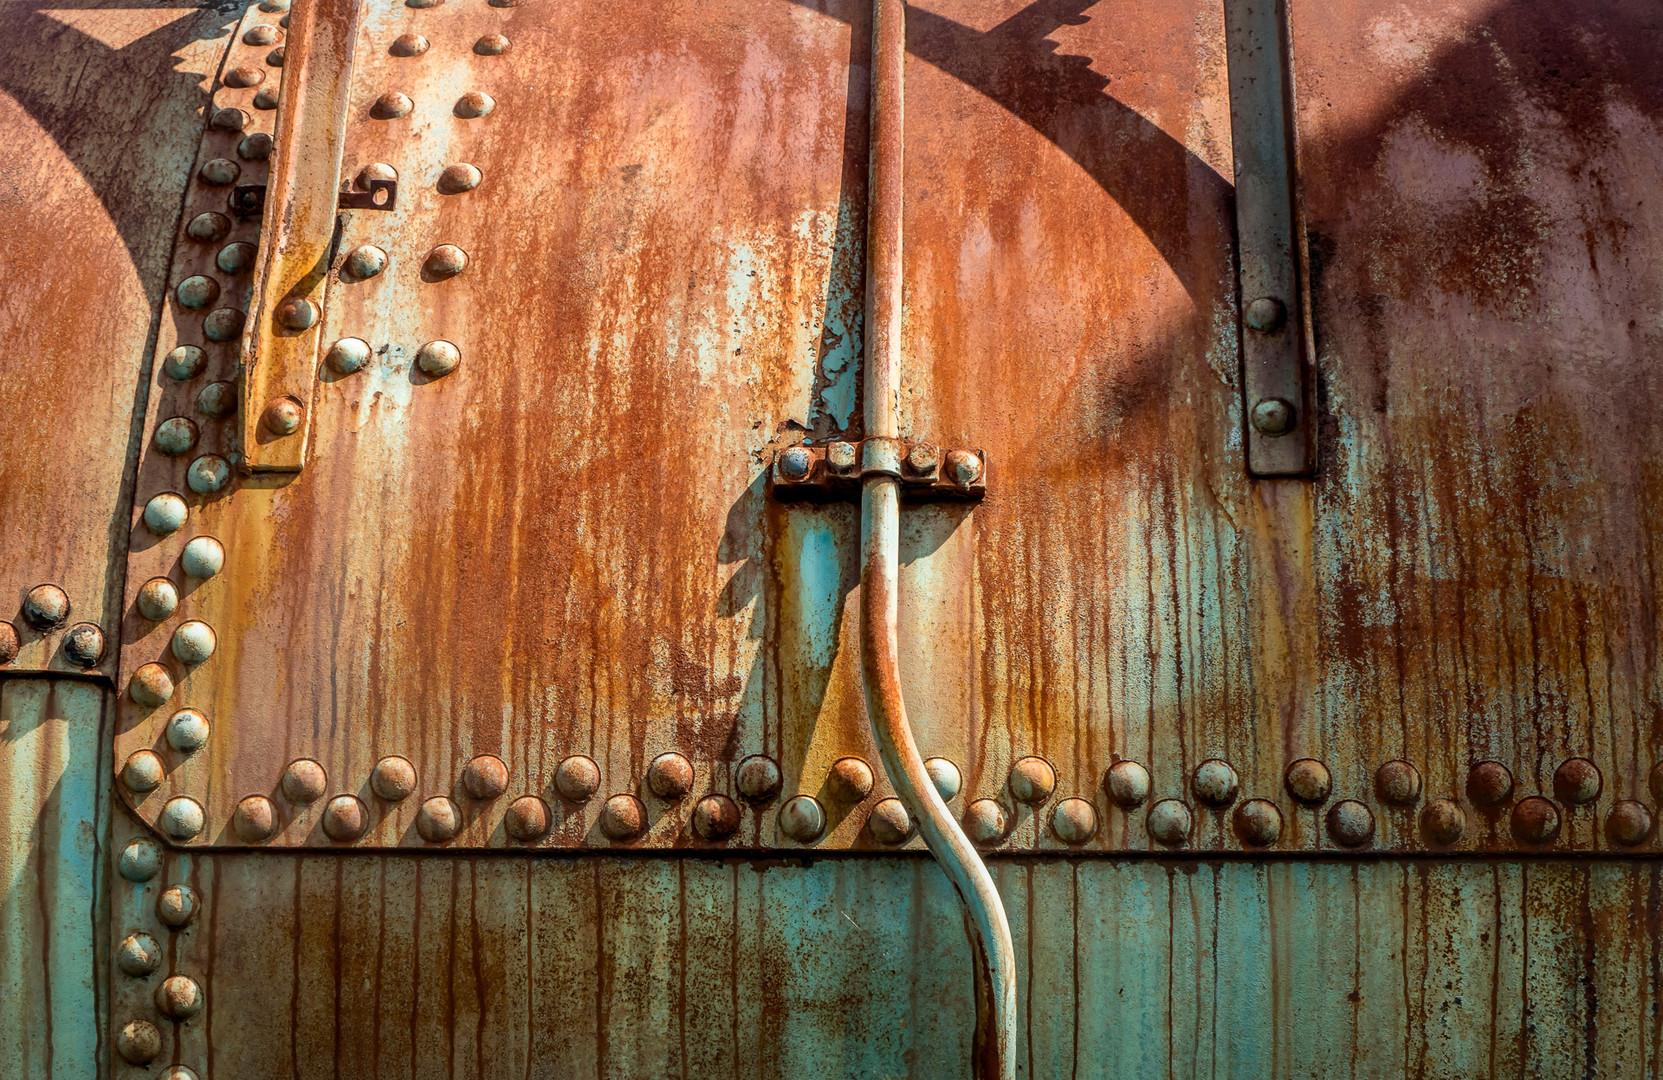 Druck im Kessel Foto & Bild | industrie und technik, bergbau ...